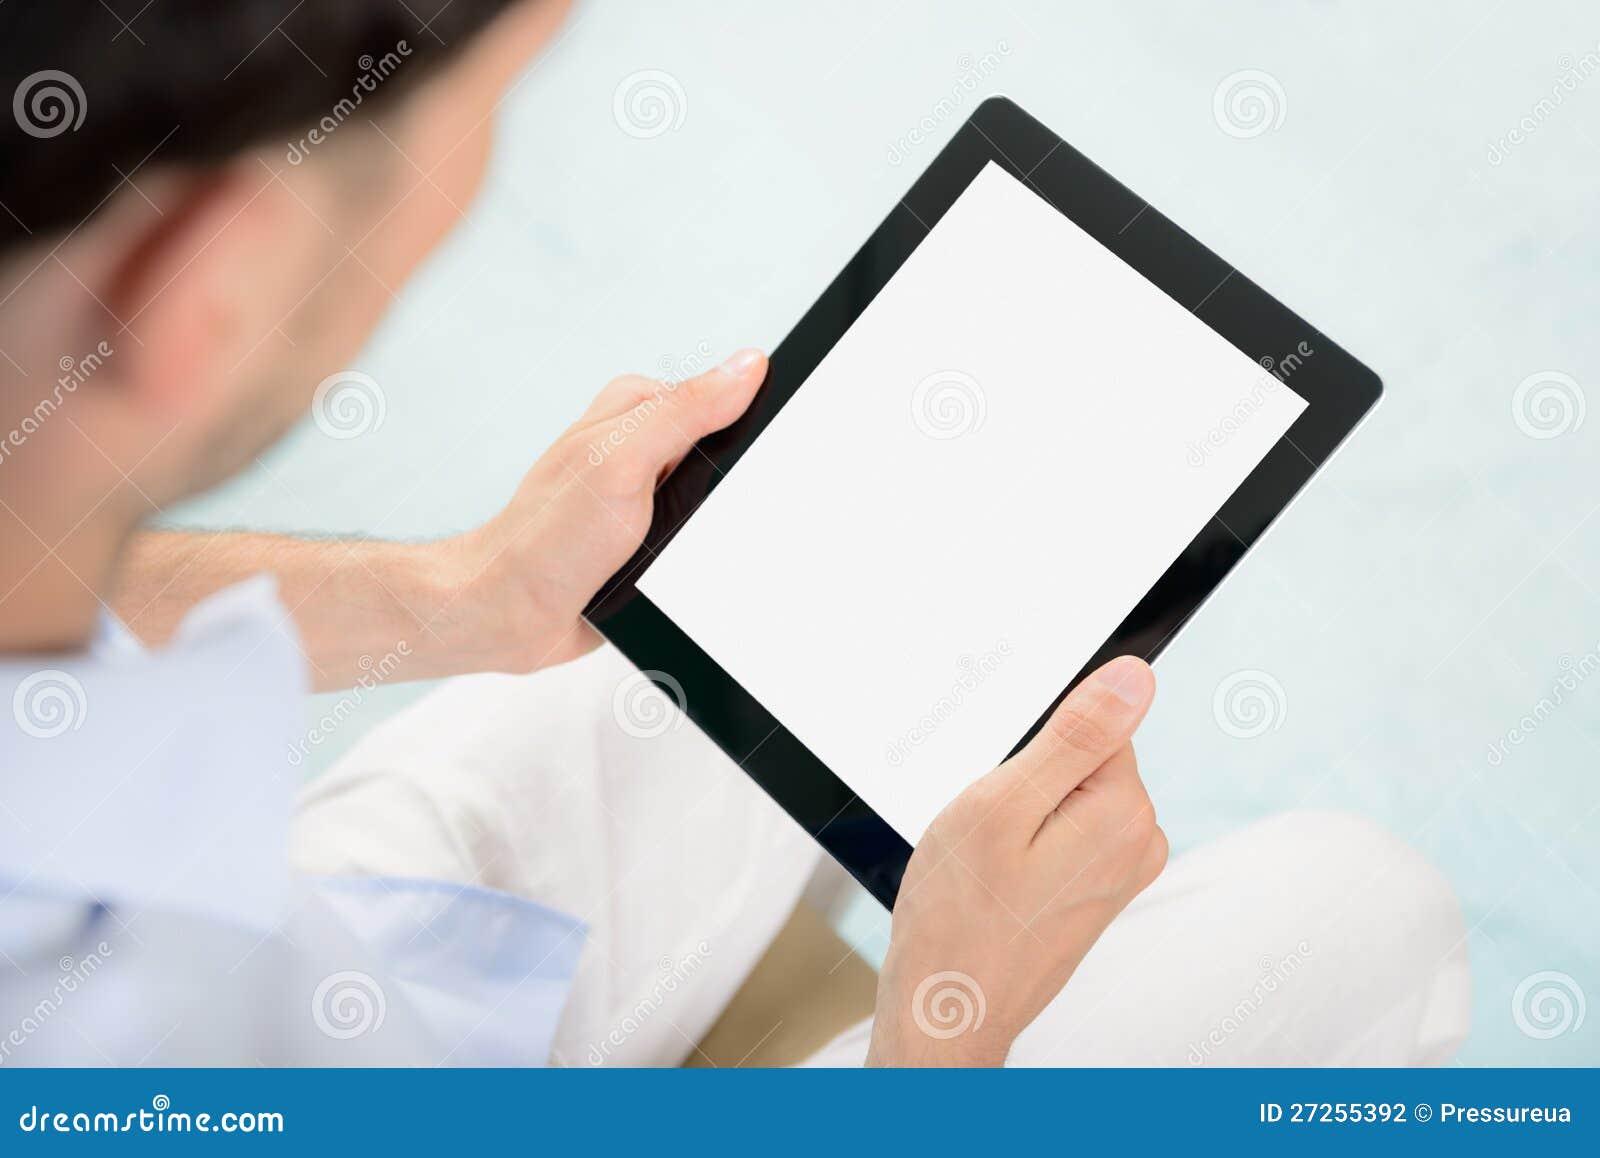 holding the man pdf free